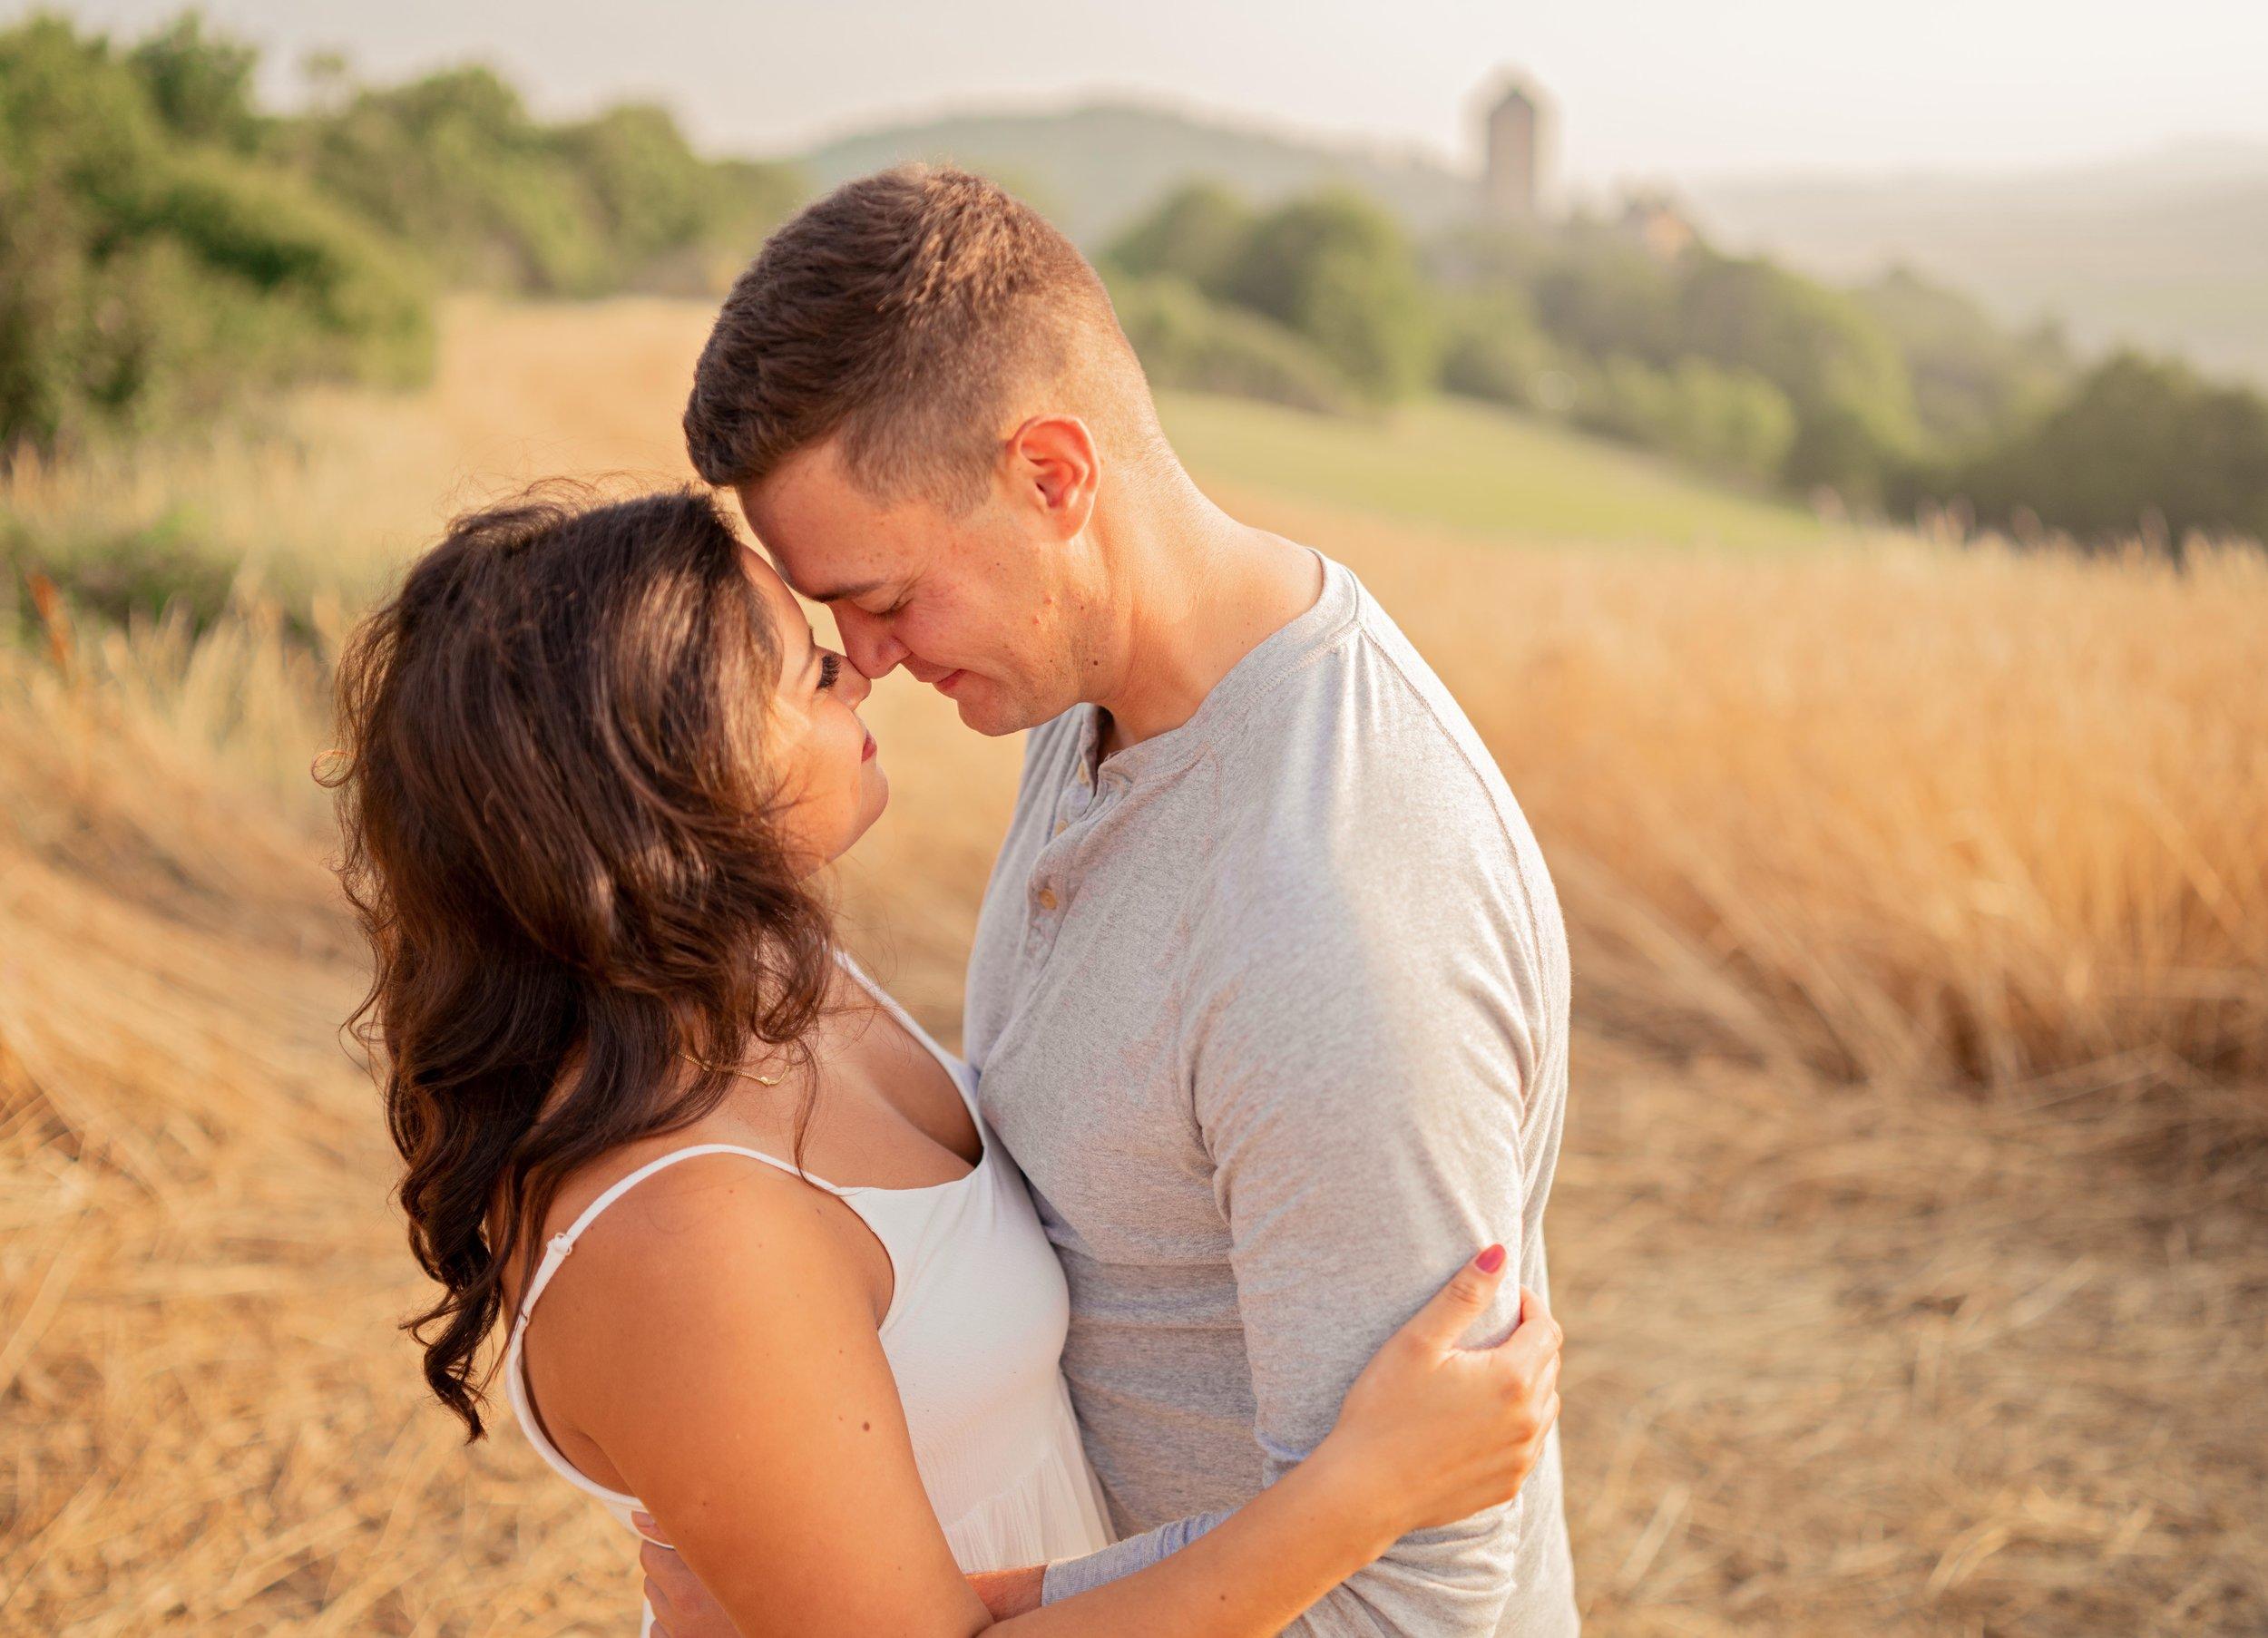 ramstein-kmc-couple-engagement-photographer-lichtenberg-castle-sarah-havens (7).jpg